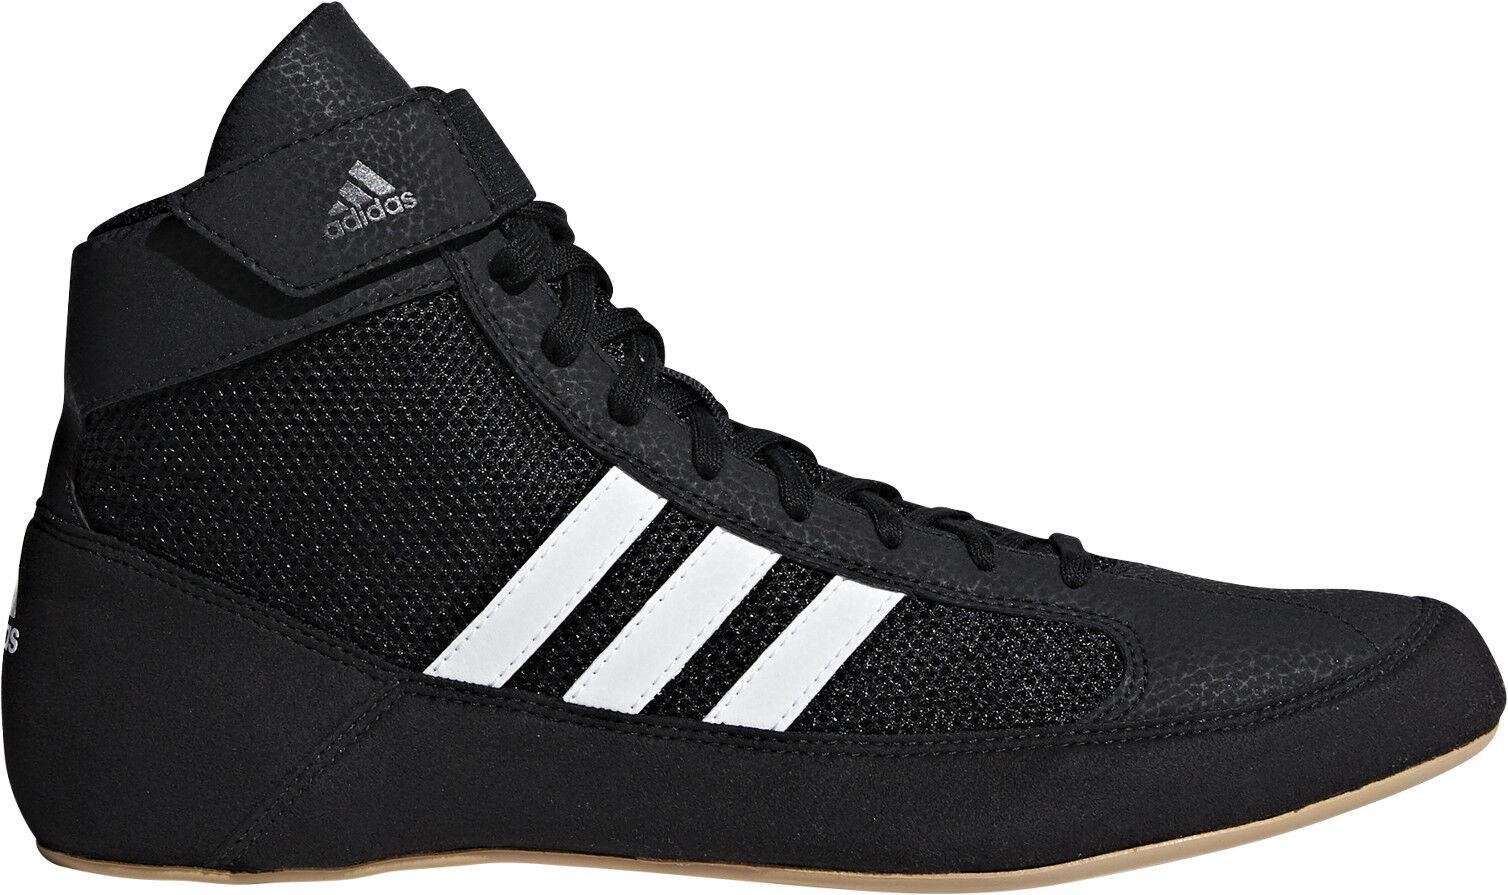 Reebok Combat Mens Boxing Shoes Black Lightweight Cushioned